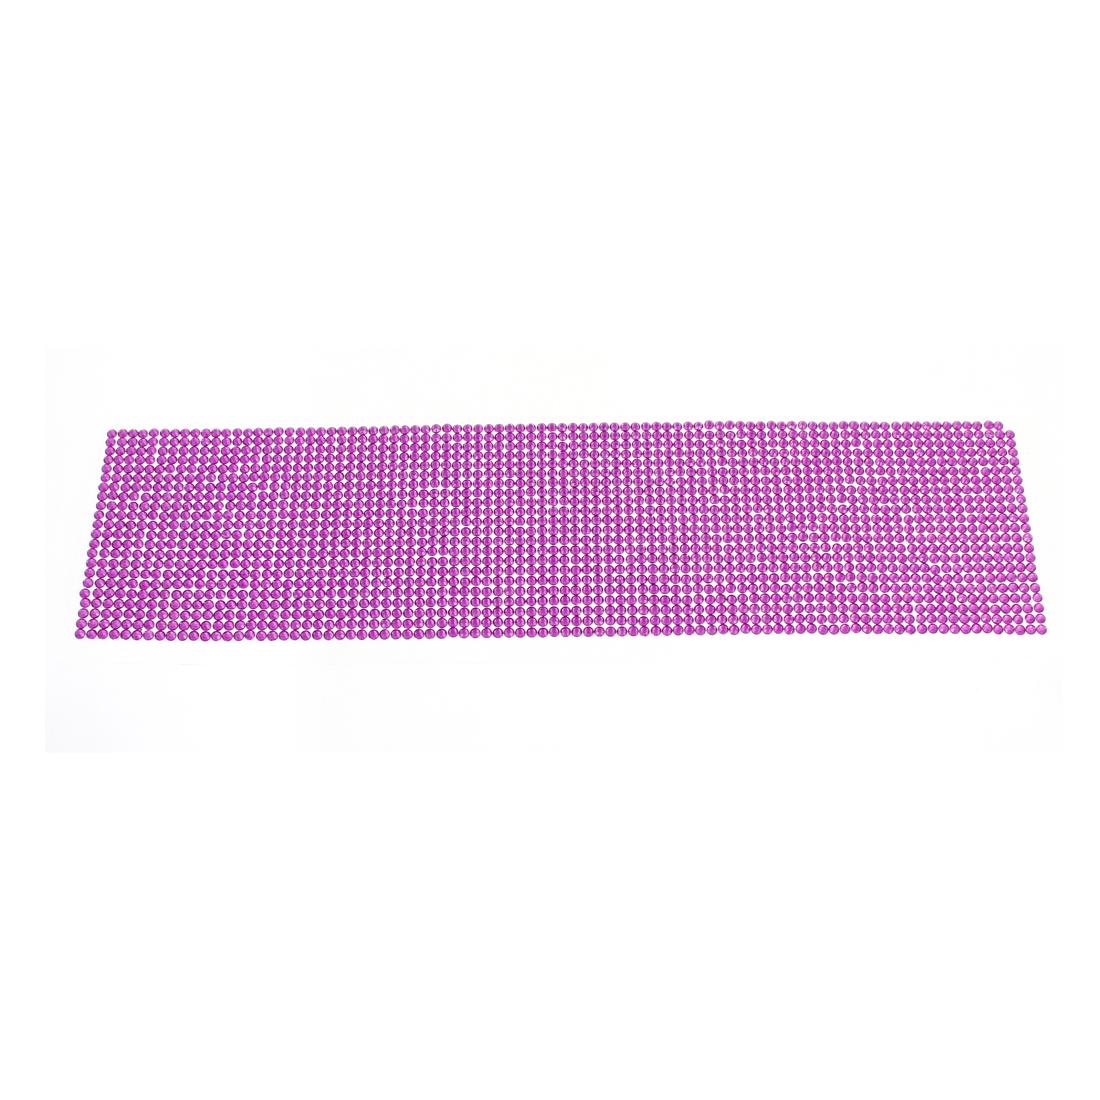 36cm x 9cm DIY Purple Mini Rhinestone Self Adhesive Stickers Decor for Vehicle